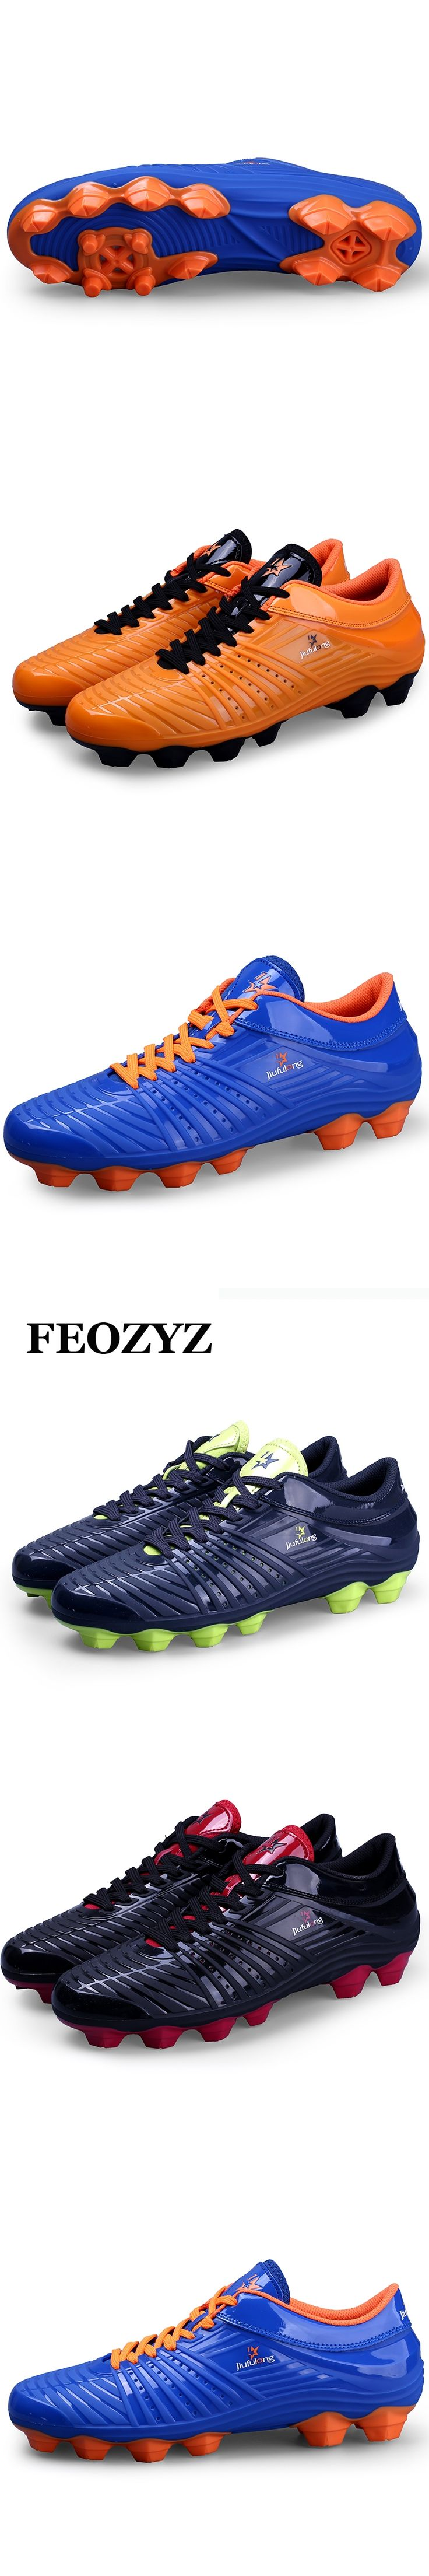 FEOZYZ AG Football Shoes Men Soccer Boots Training Football Boots Outdoor  Soccer Cleats Chuteiras Scarpe Calcio